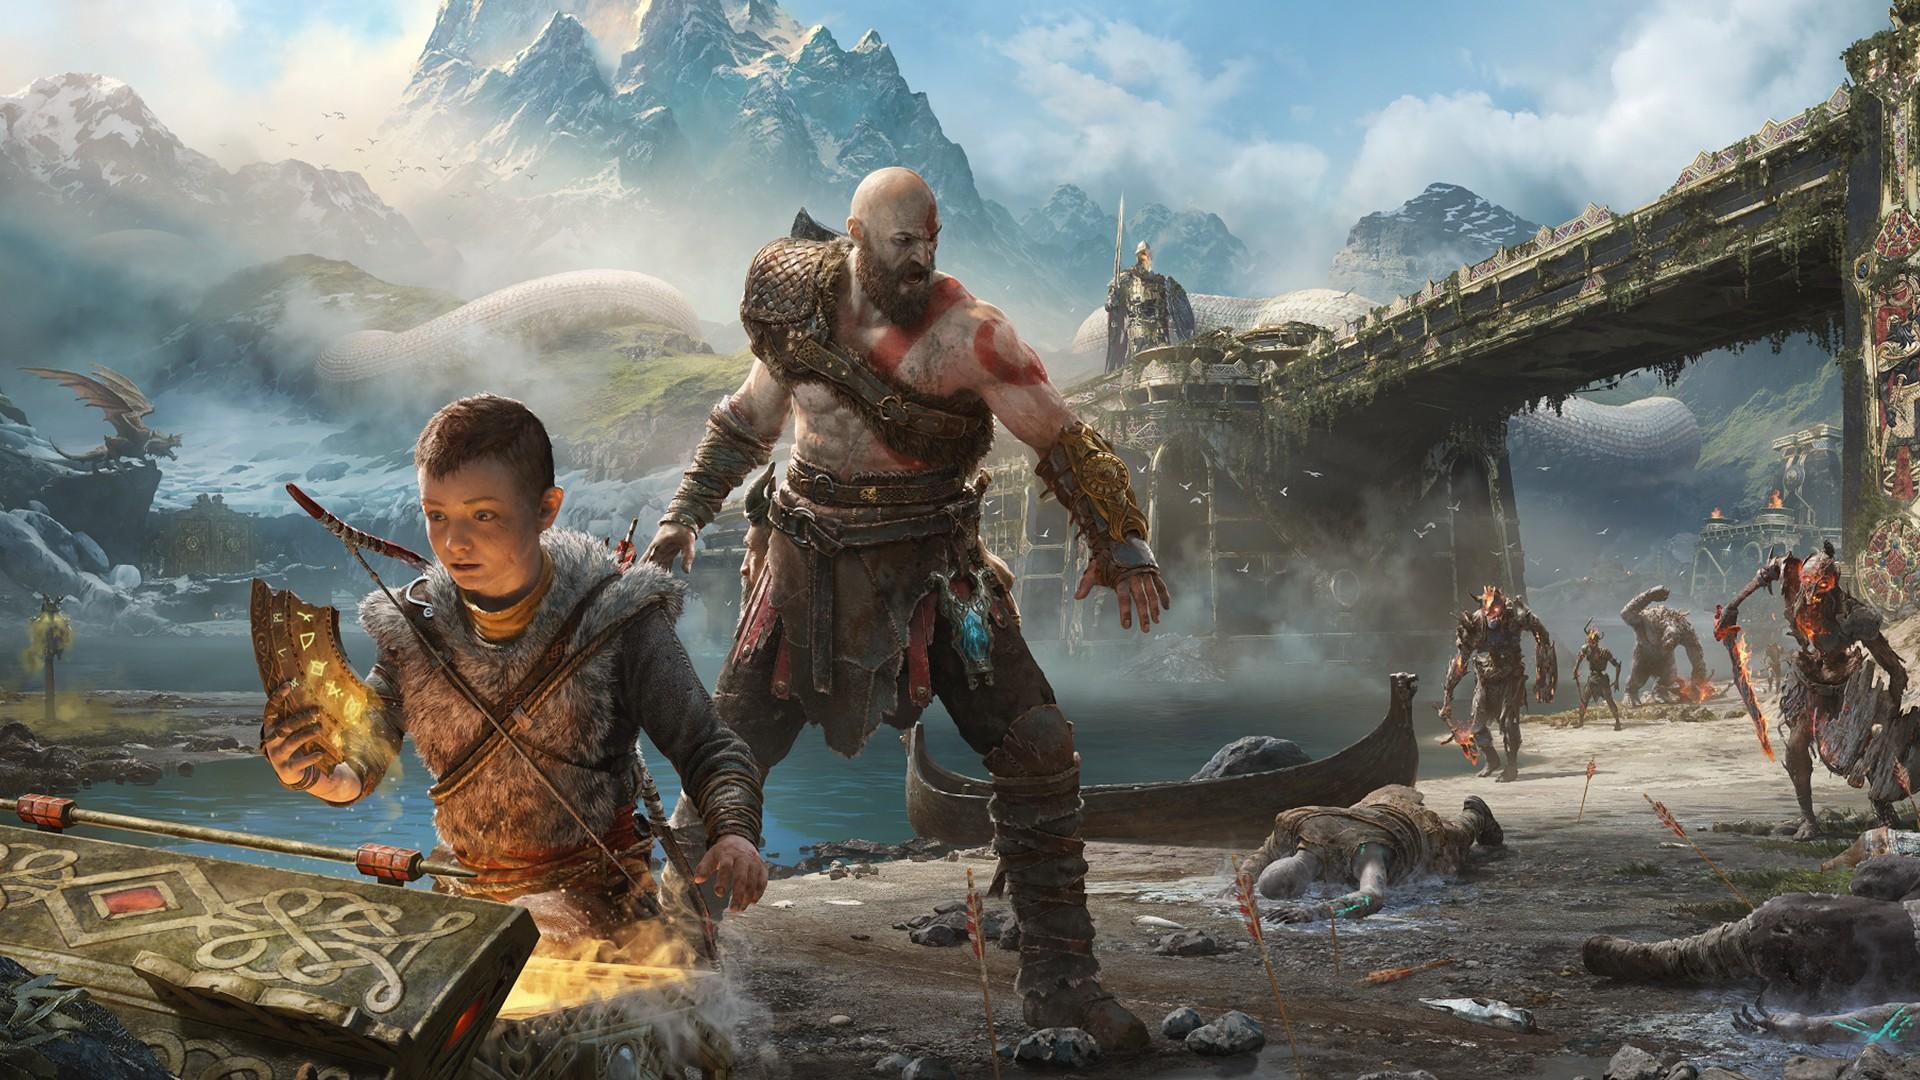 God Of War Wallpaper Hd 3d Download Kratos And Atreus In God Of War Wallpapers Hd Wallpapers